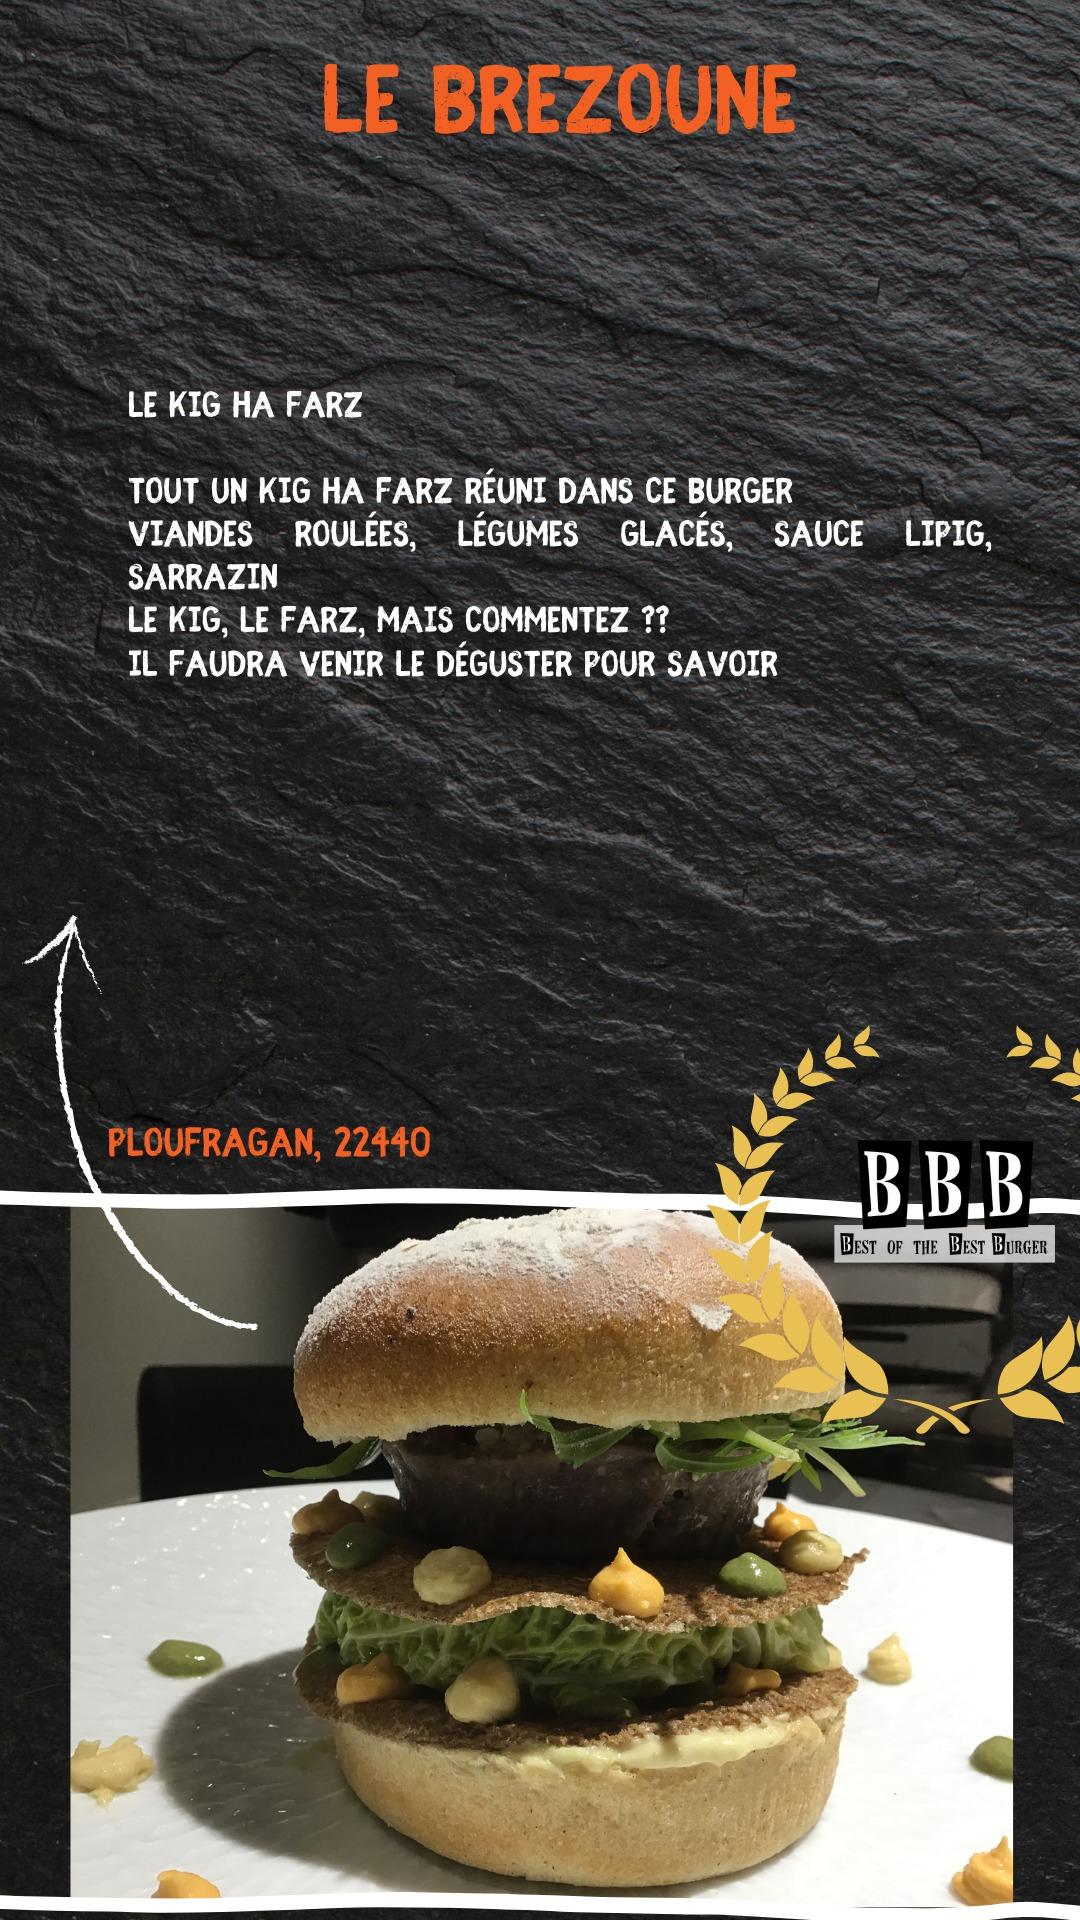 Burger de la Brezoune